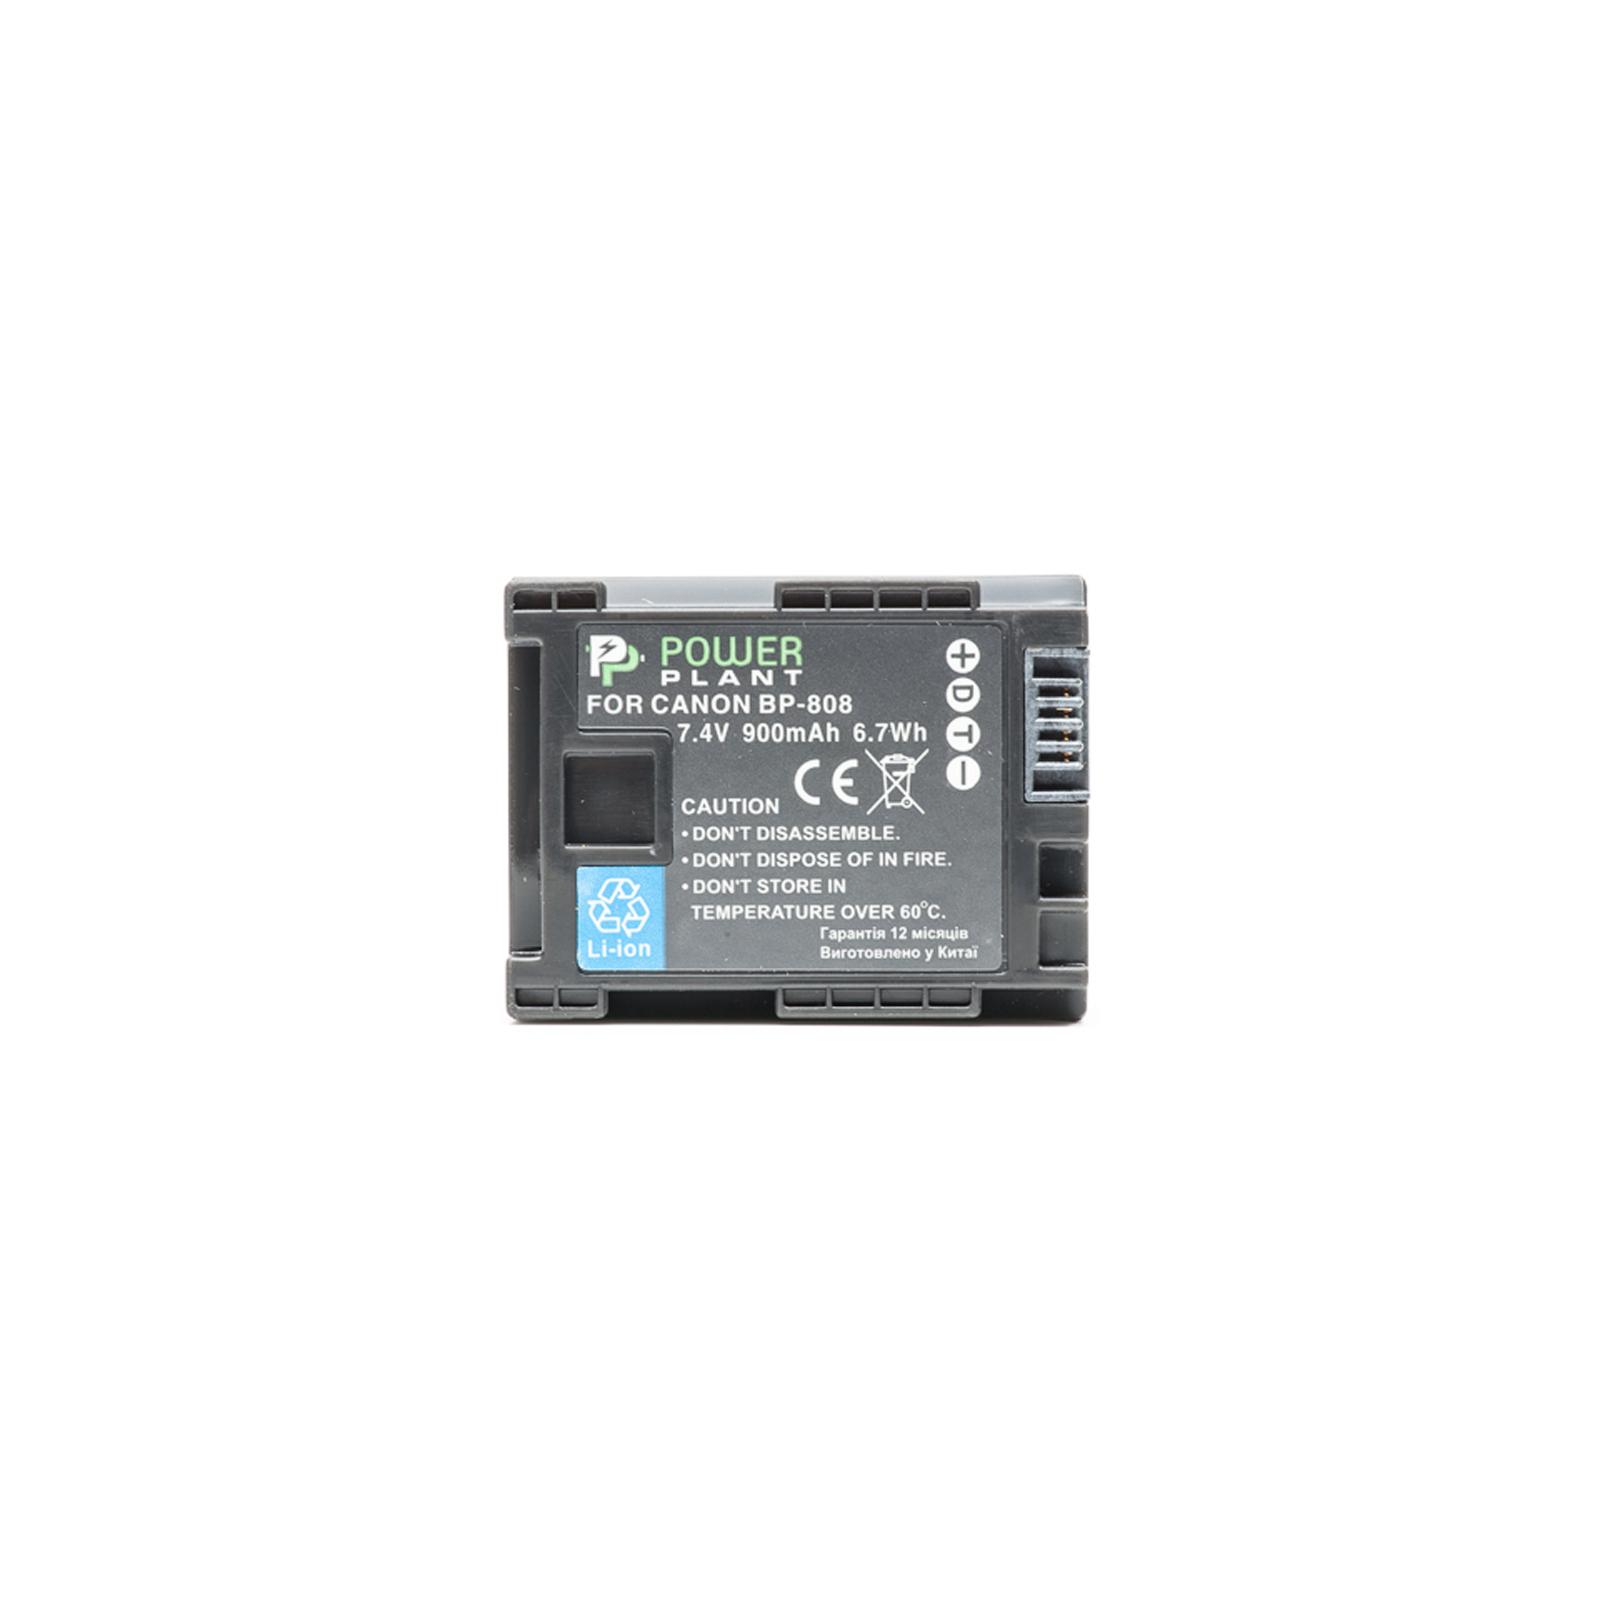 Аккумулятор к фото/видео PowerPlant Canon BP-808 Chip (DV00DV1260) изображение 2